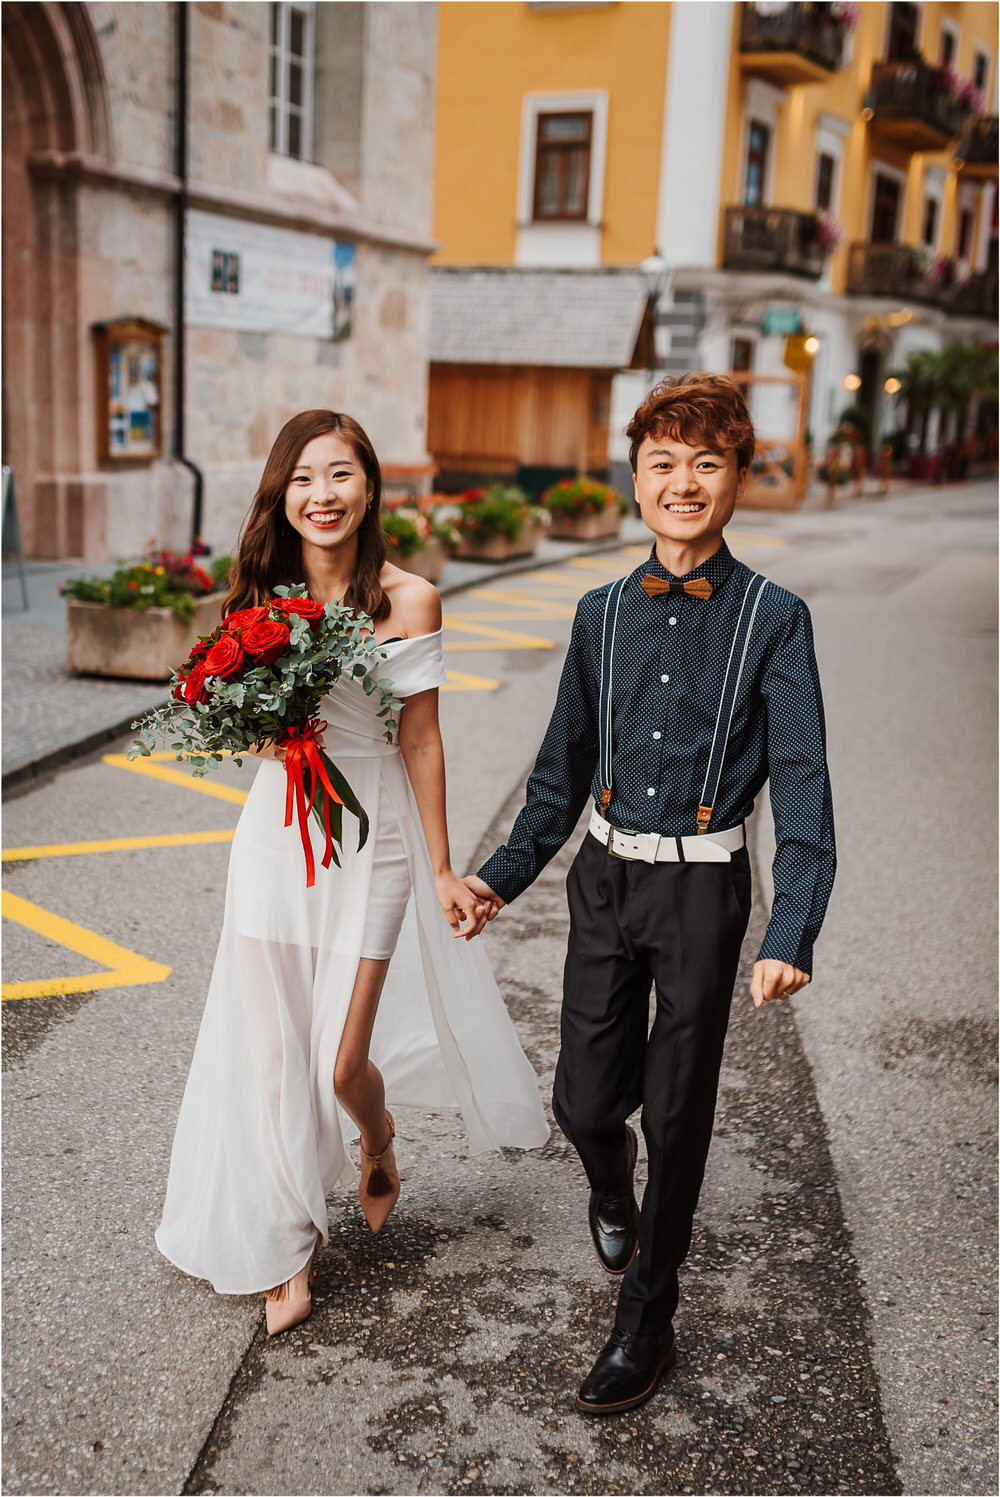 hallstatt austria wedding engagement photographer asian proposal surprise photography recommended nature professional 0007.jpg